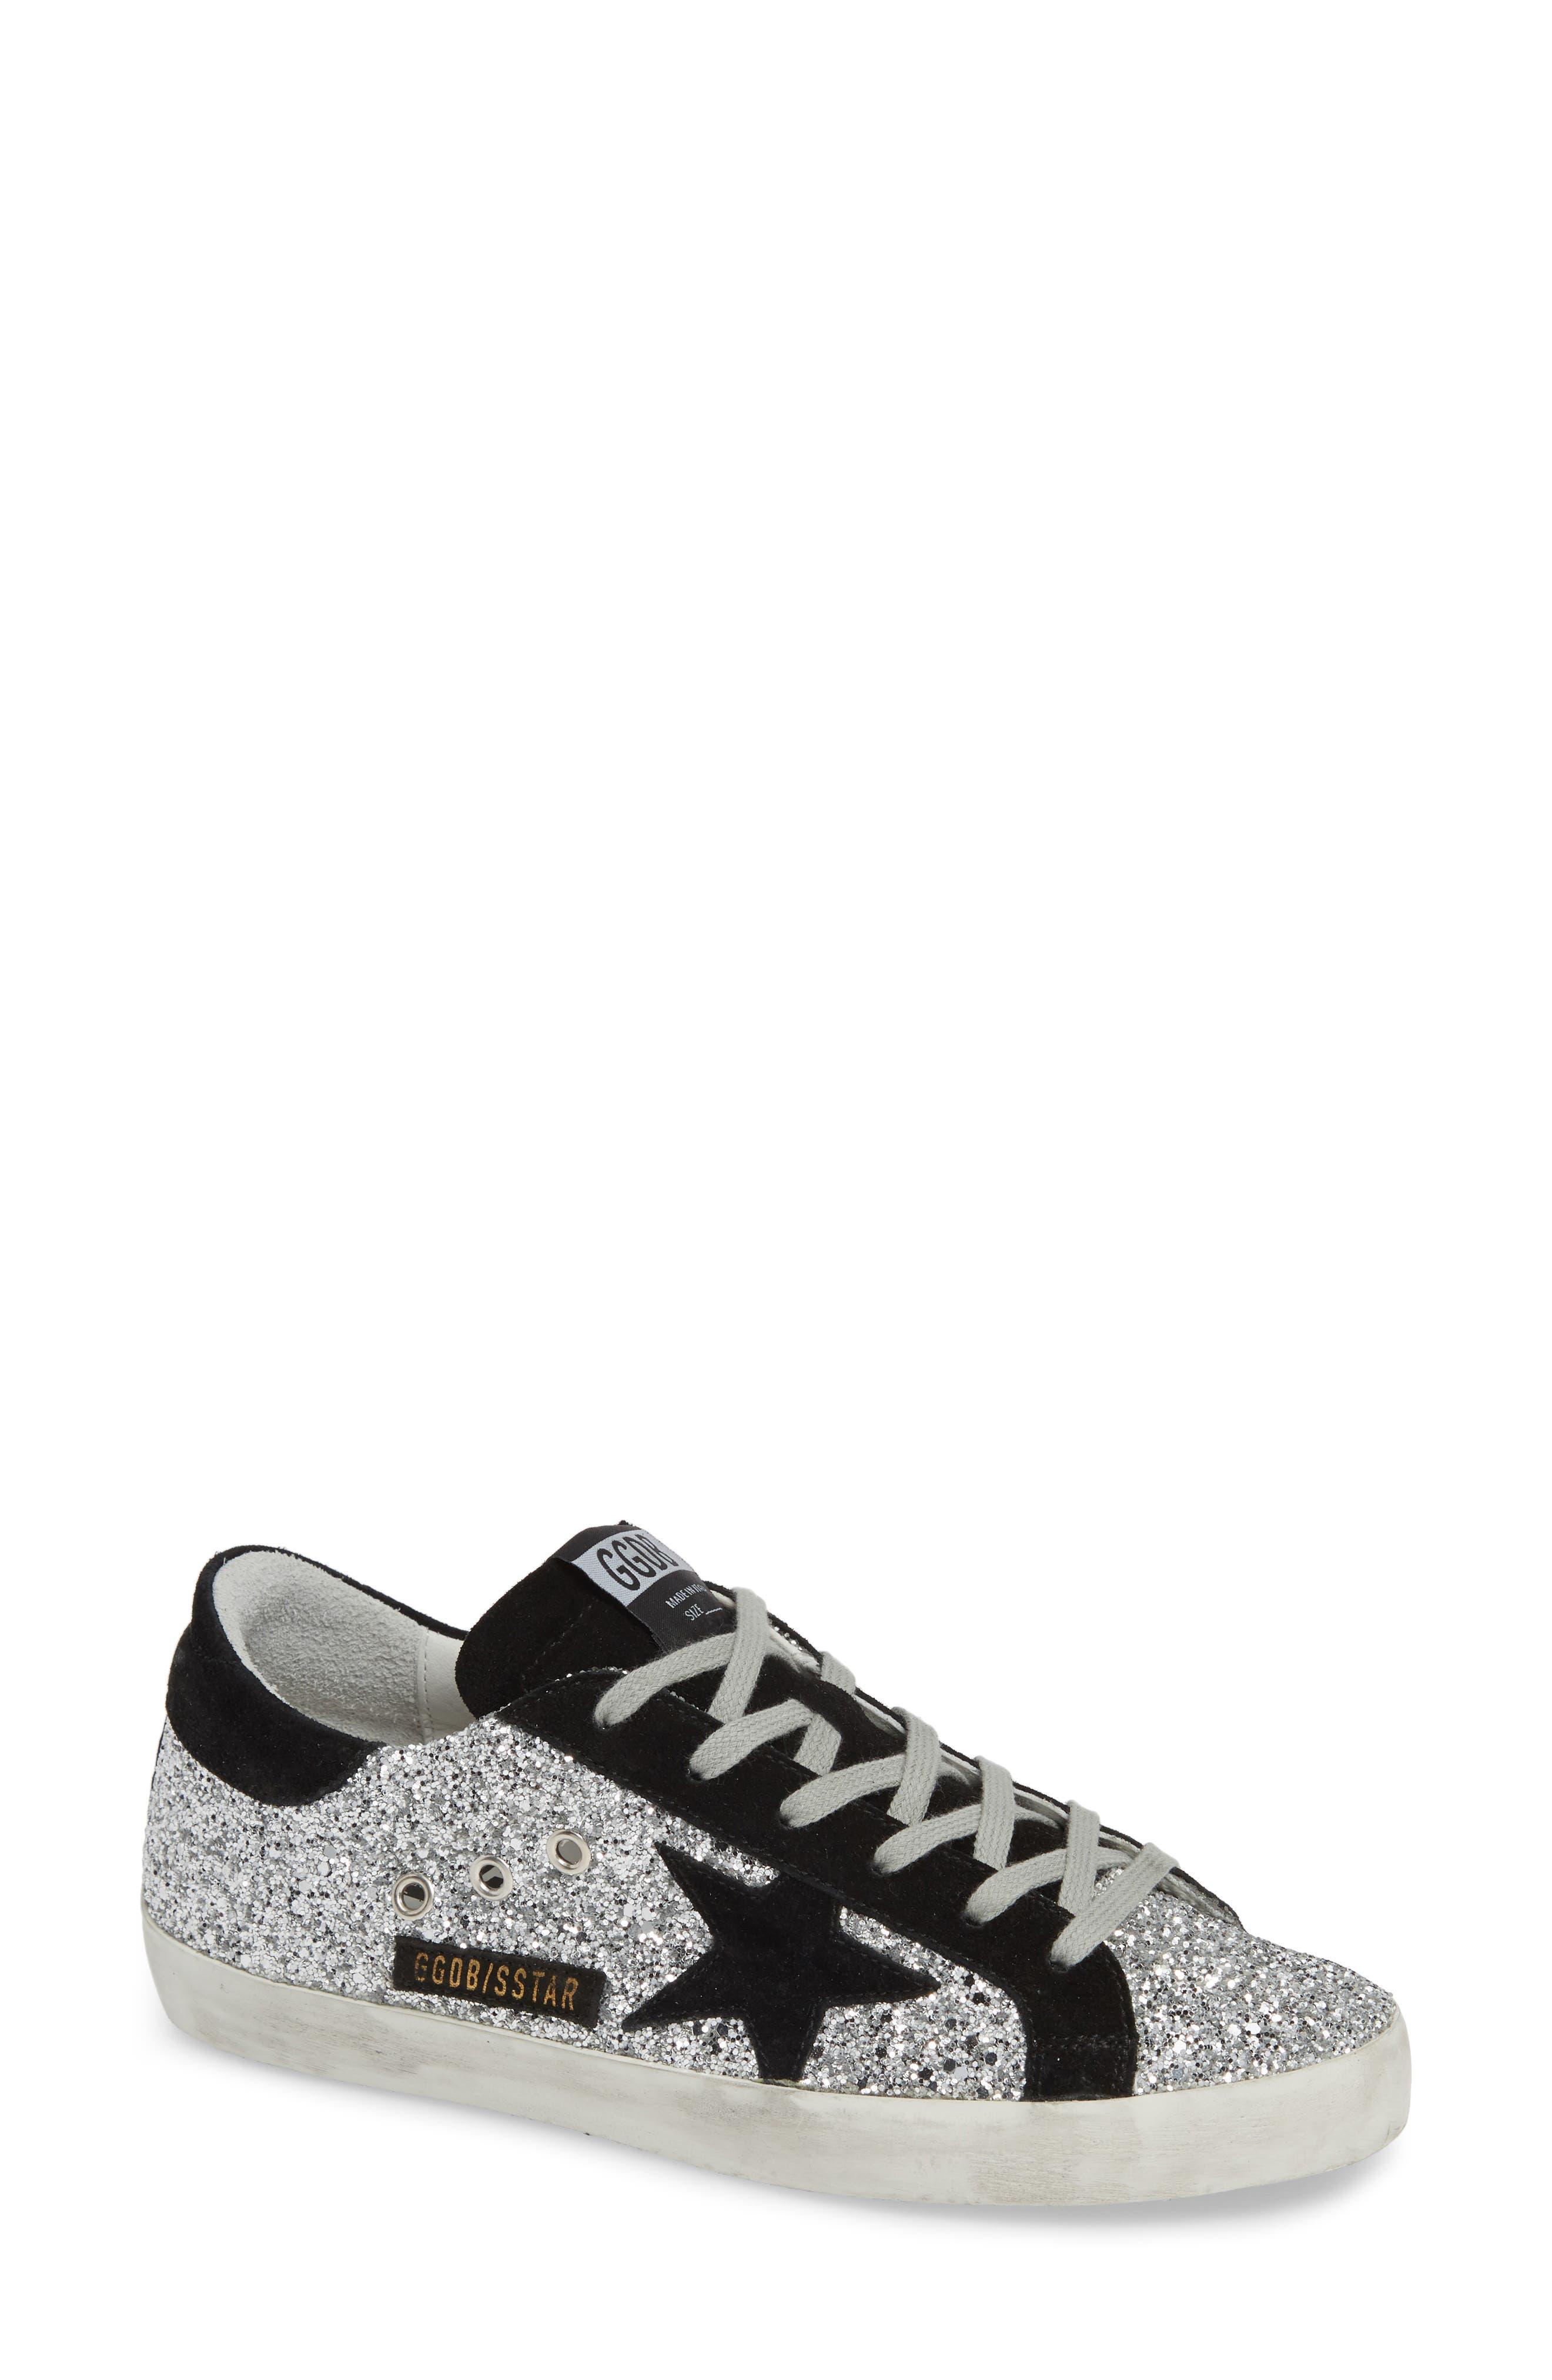 Superstar Glitter Sneaker, Main, color, 040